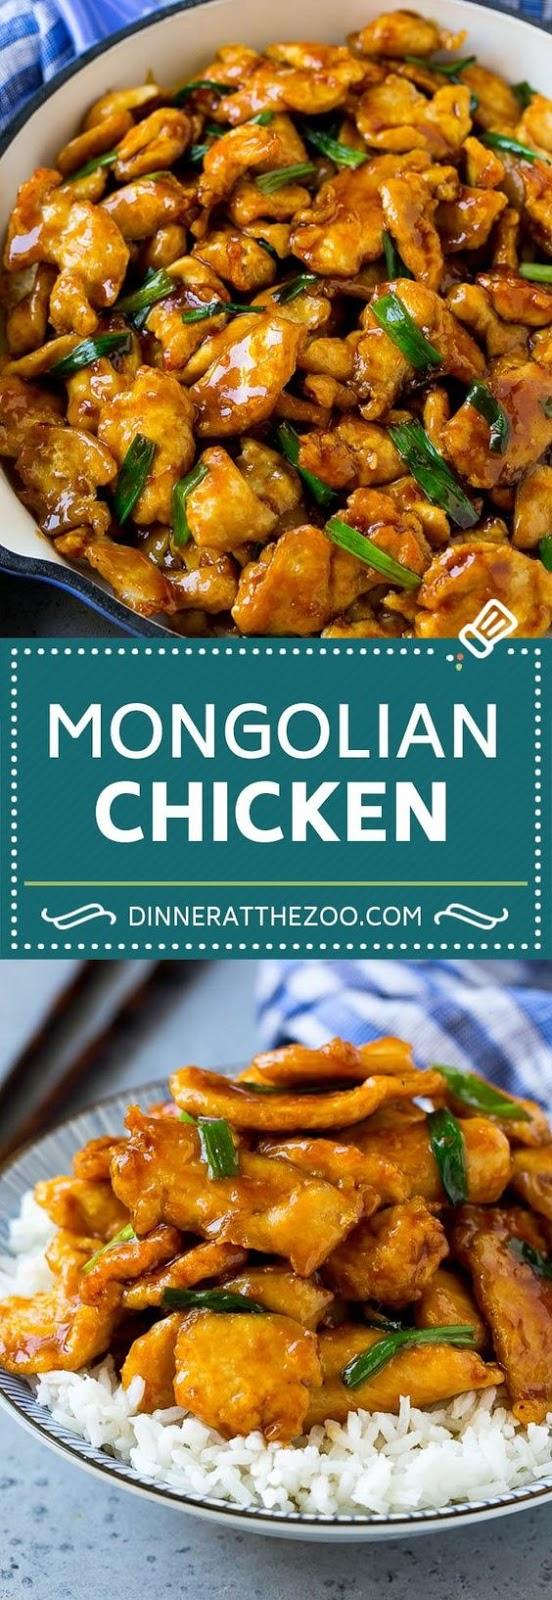 MONGOLIAN CHICKEN